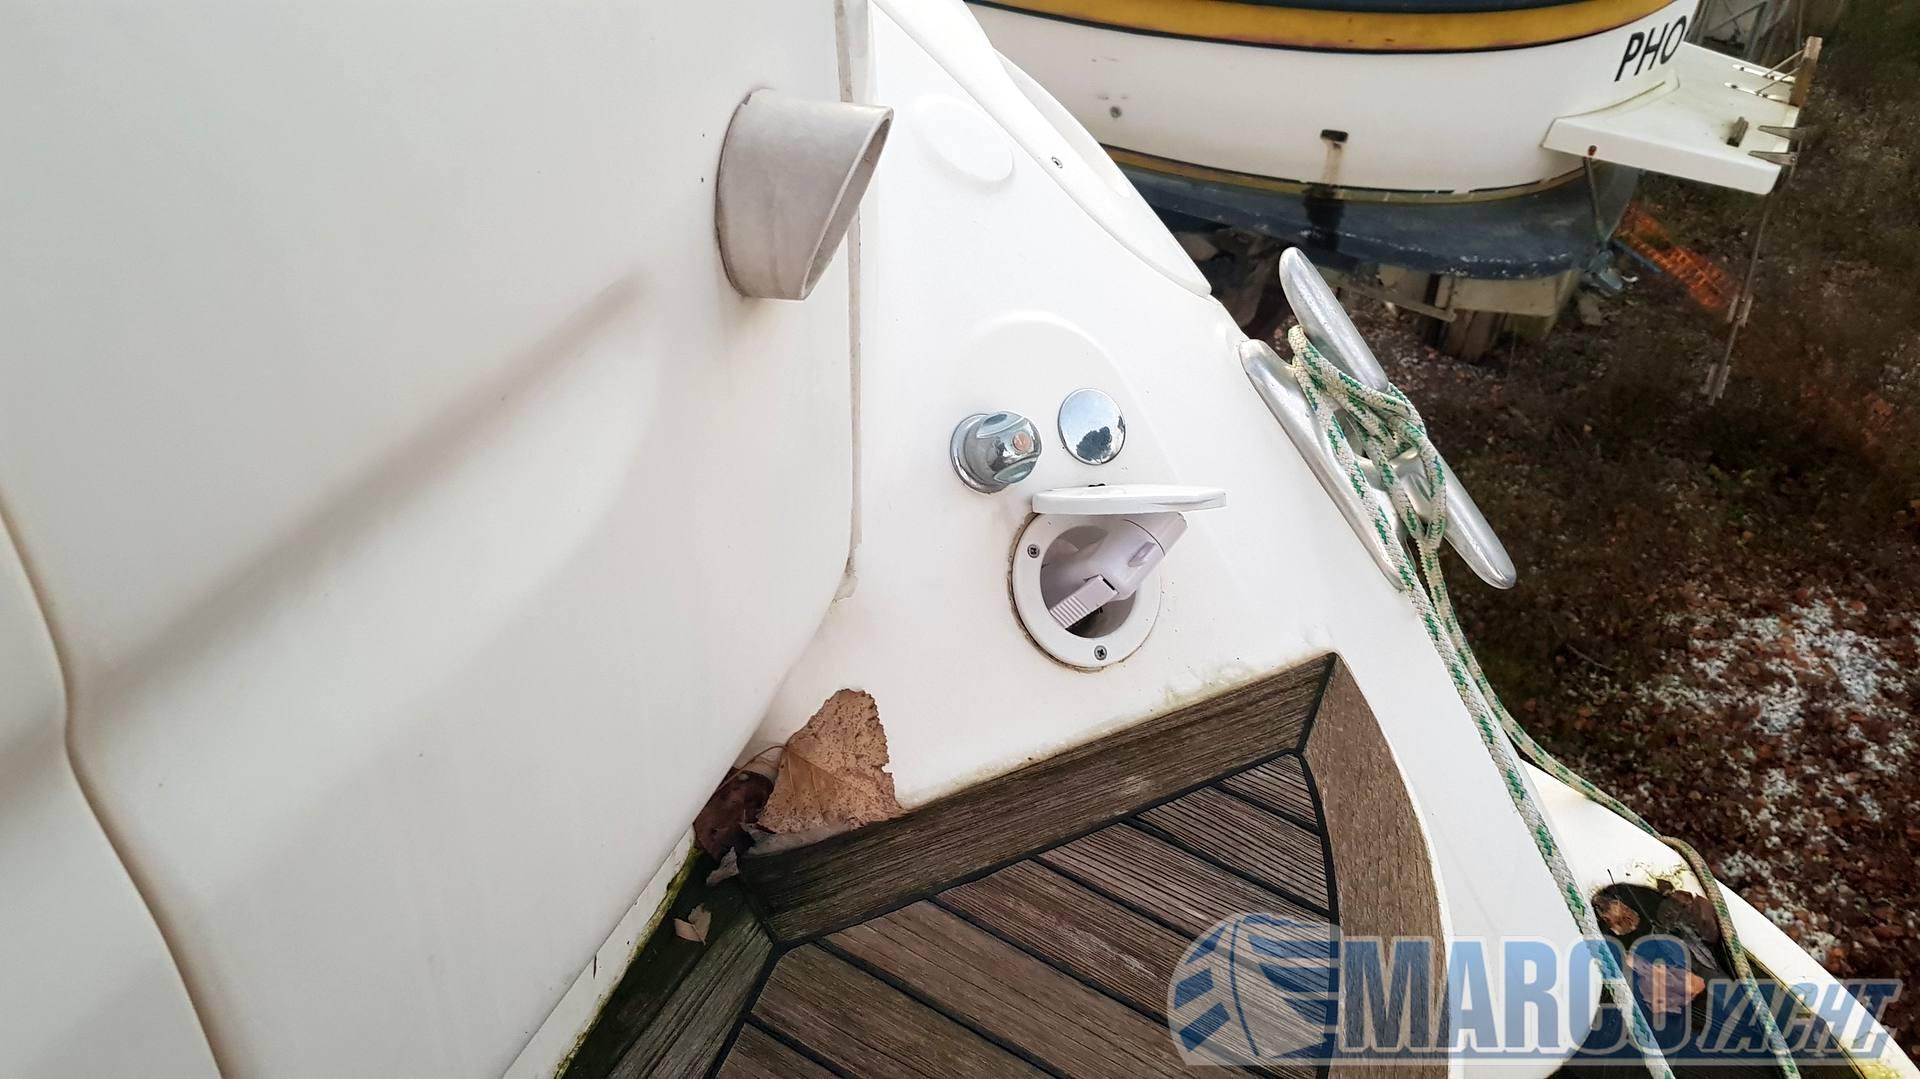 Sealine 34 open Motor boat used for sale